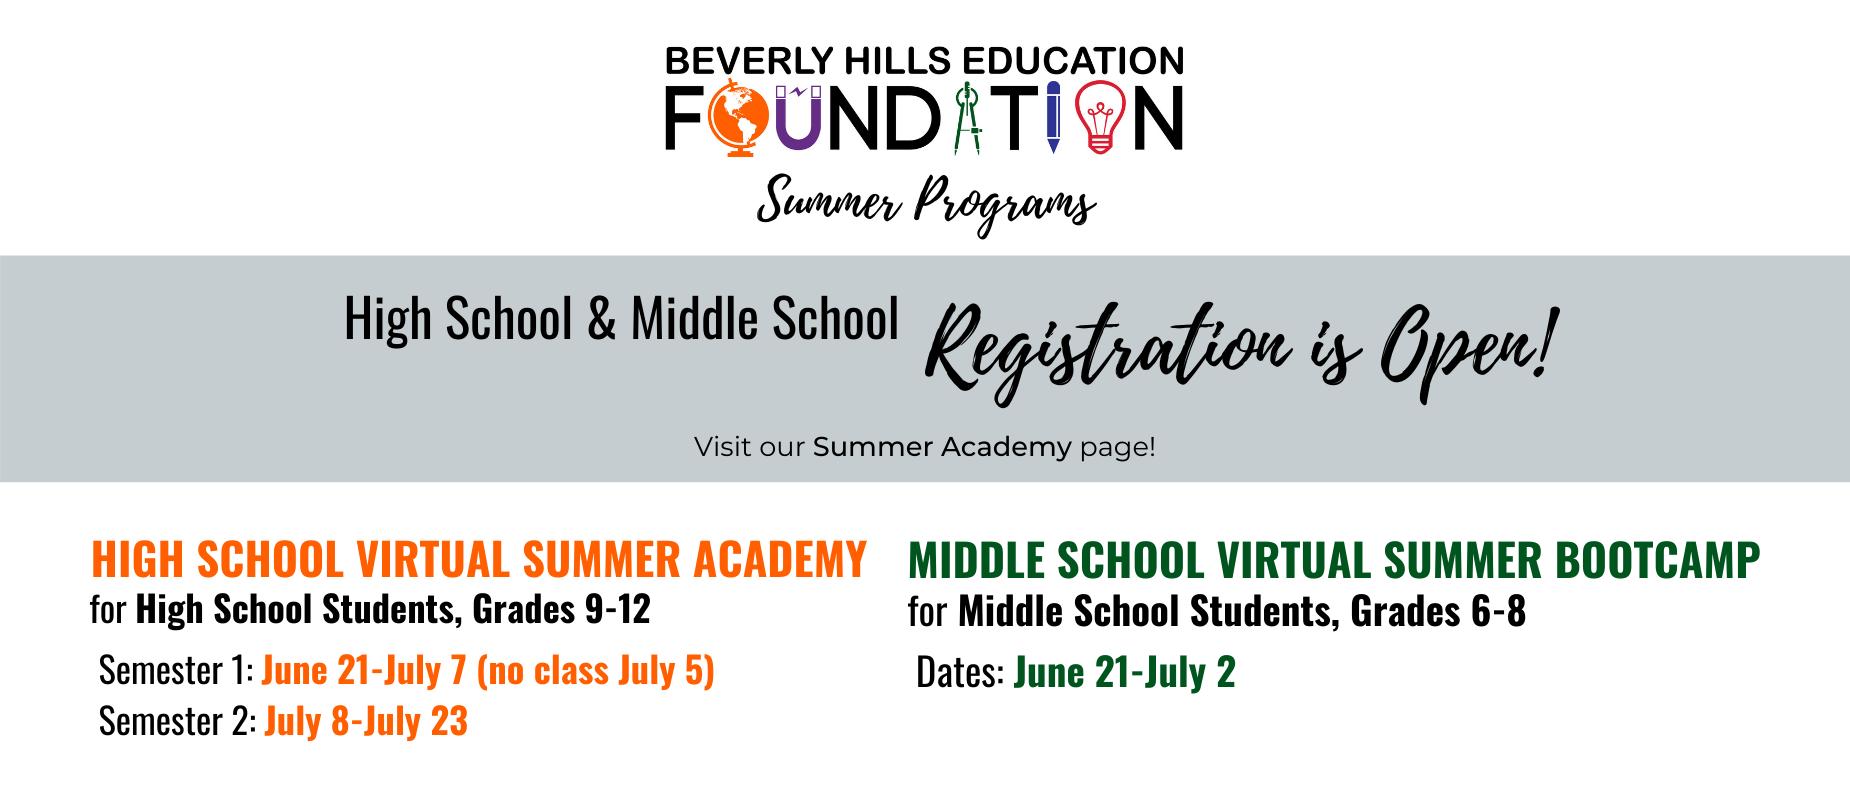 HS MS Registration is Open